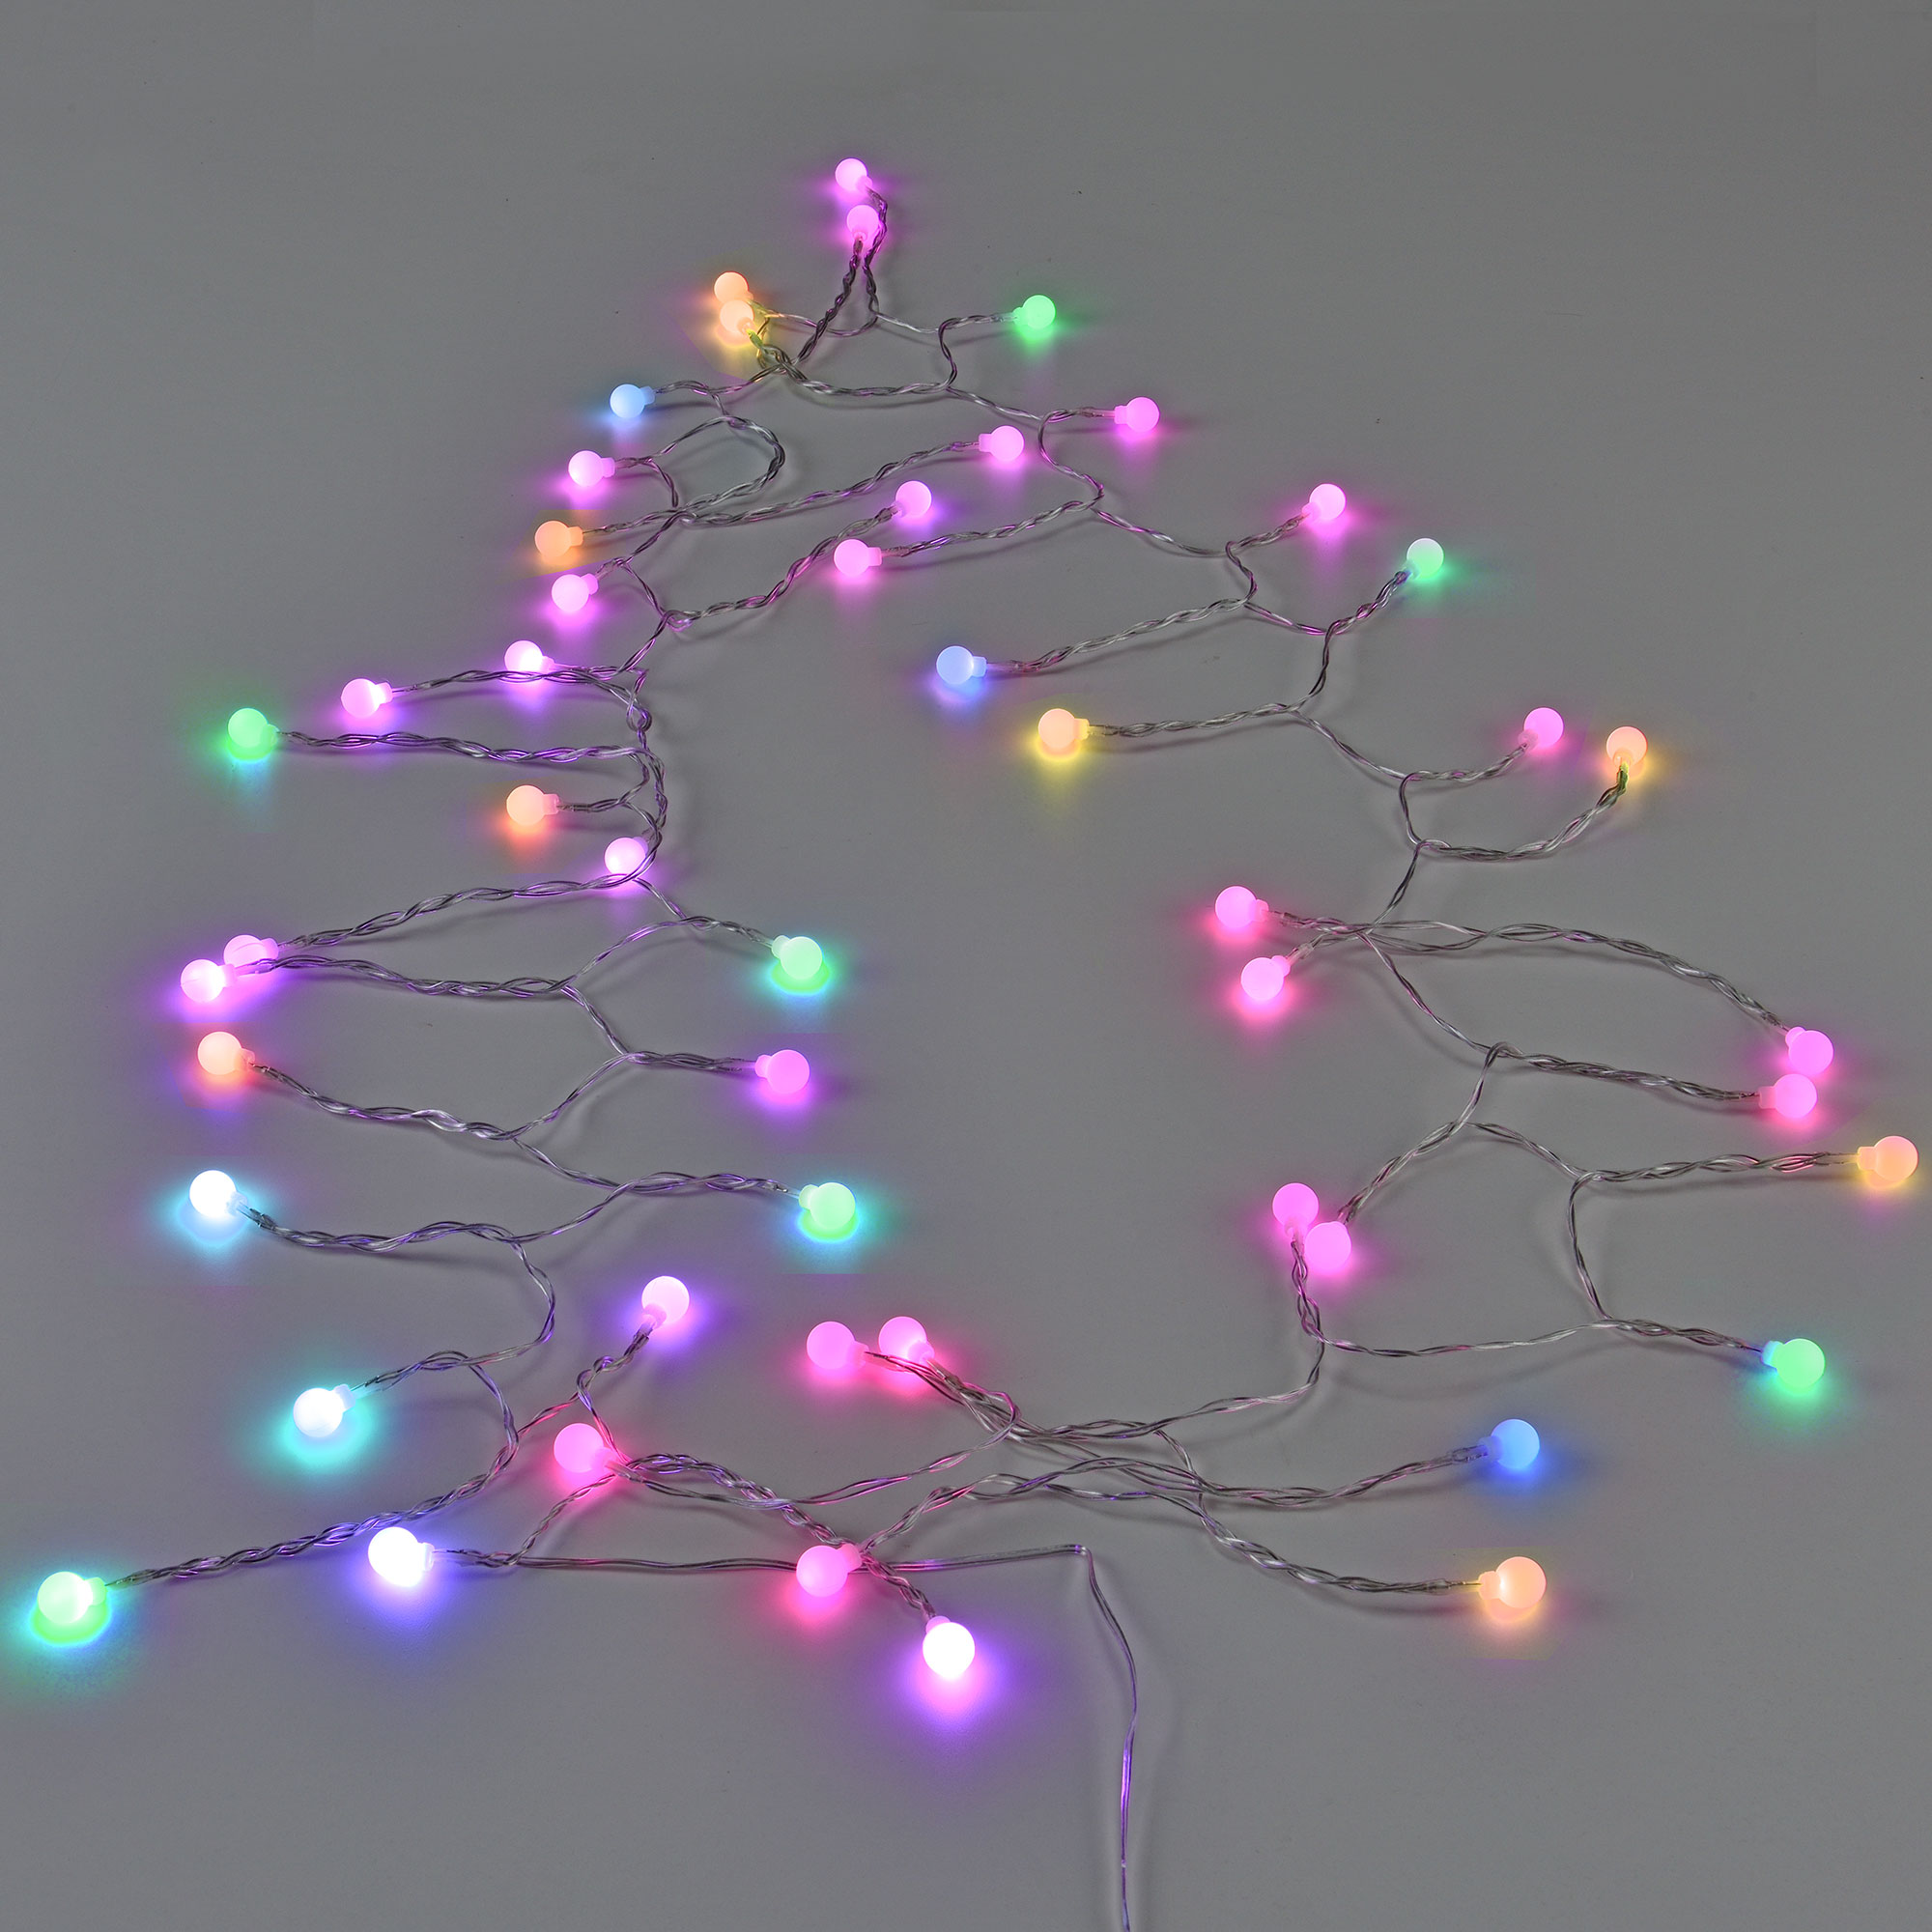 led kugel lichterkette netzteil innen au en weihnachten bunt kerze ebay. Black Bedroom Furniture Sets. Home Design Ideas